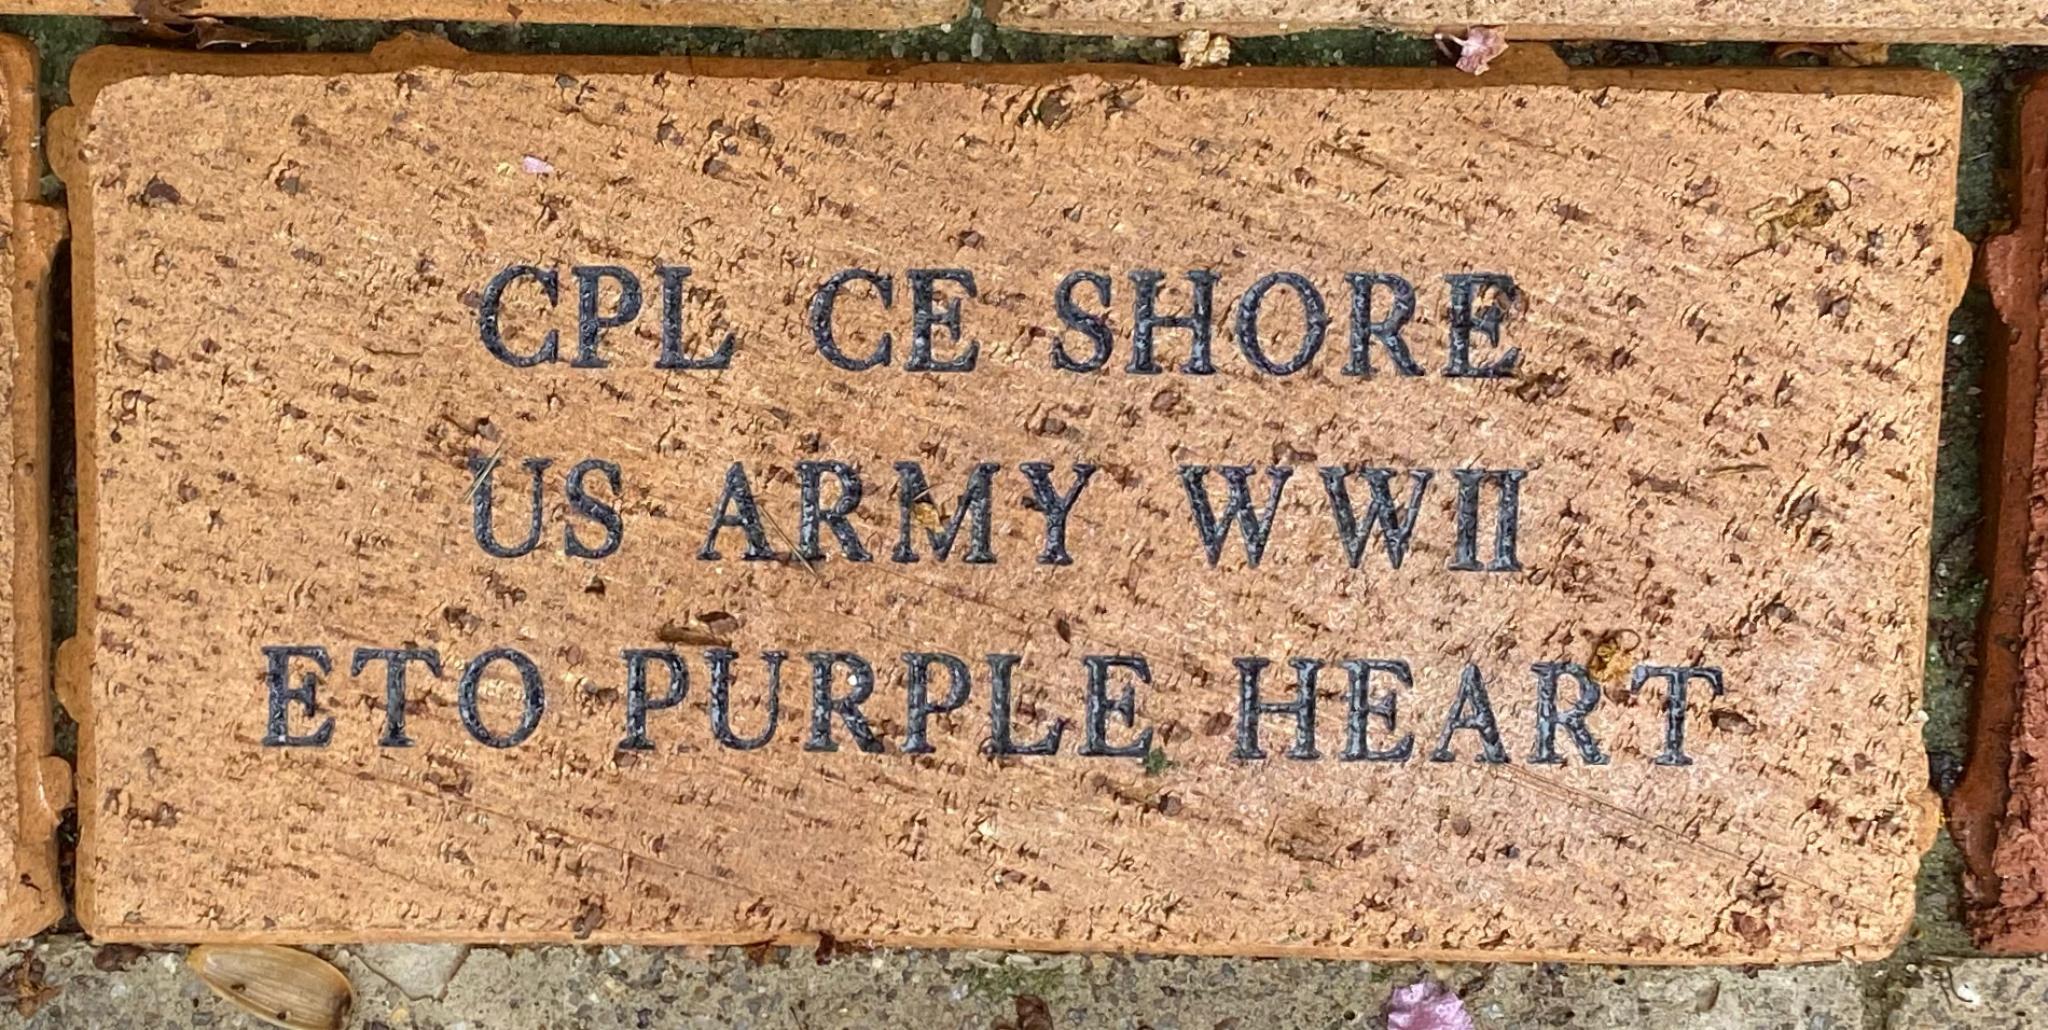 CPL CE SHORE US ARMY WWII ETO PURPLE HEART